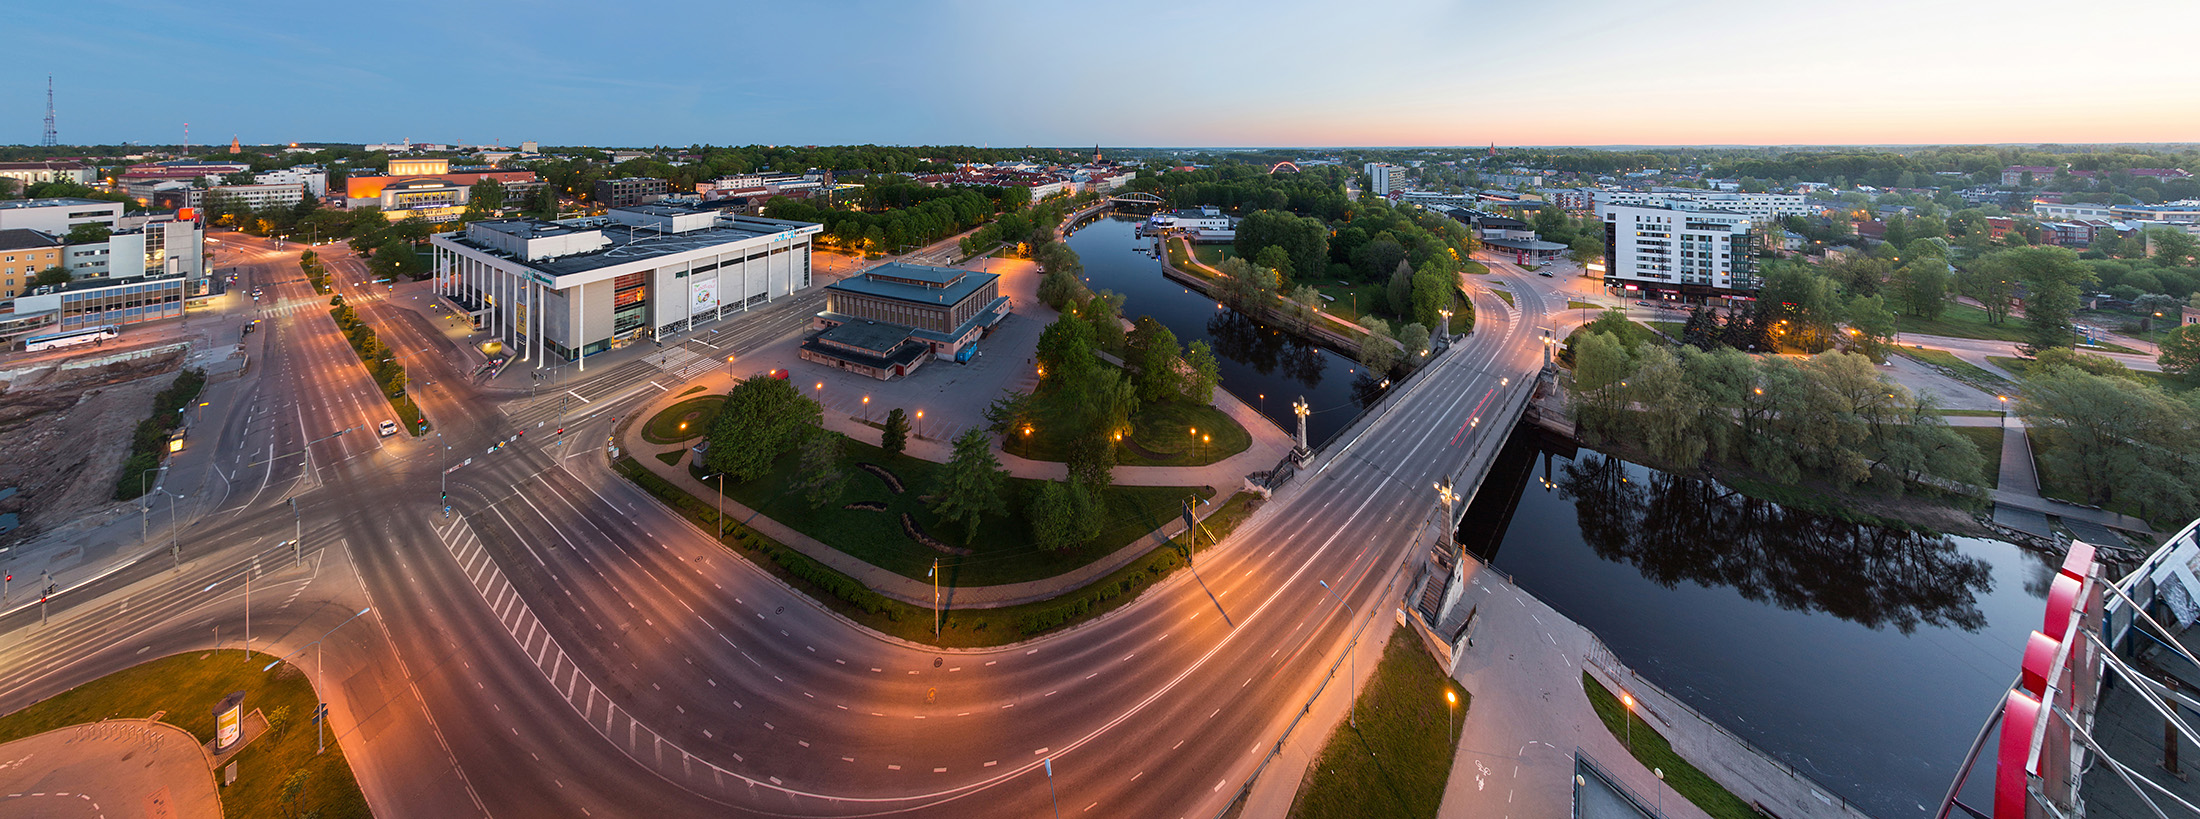 Tartu-small-2000